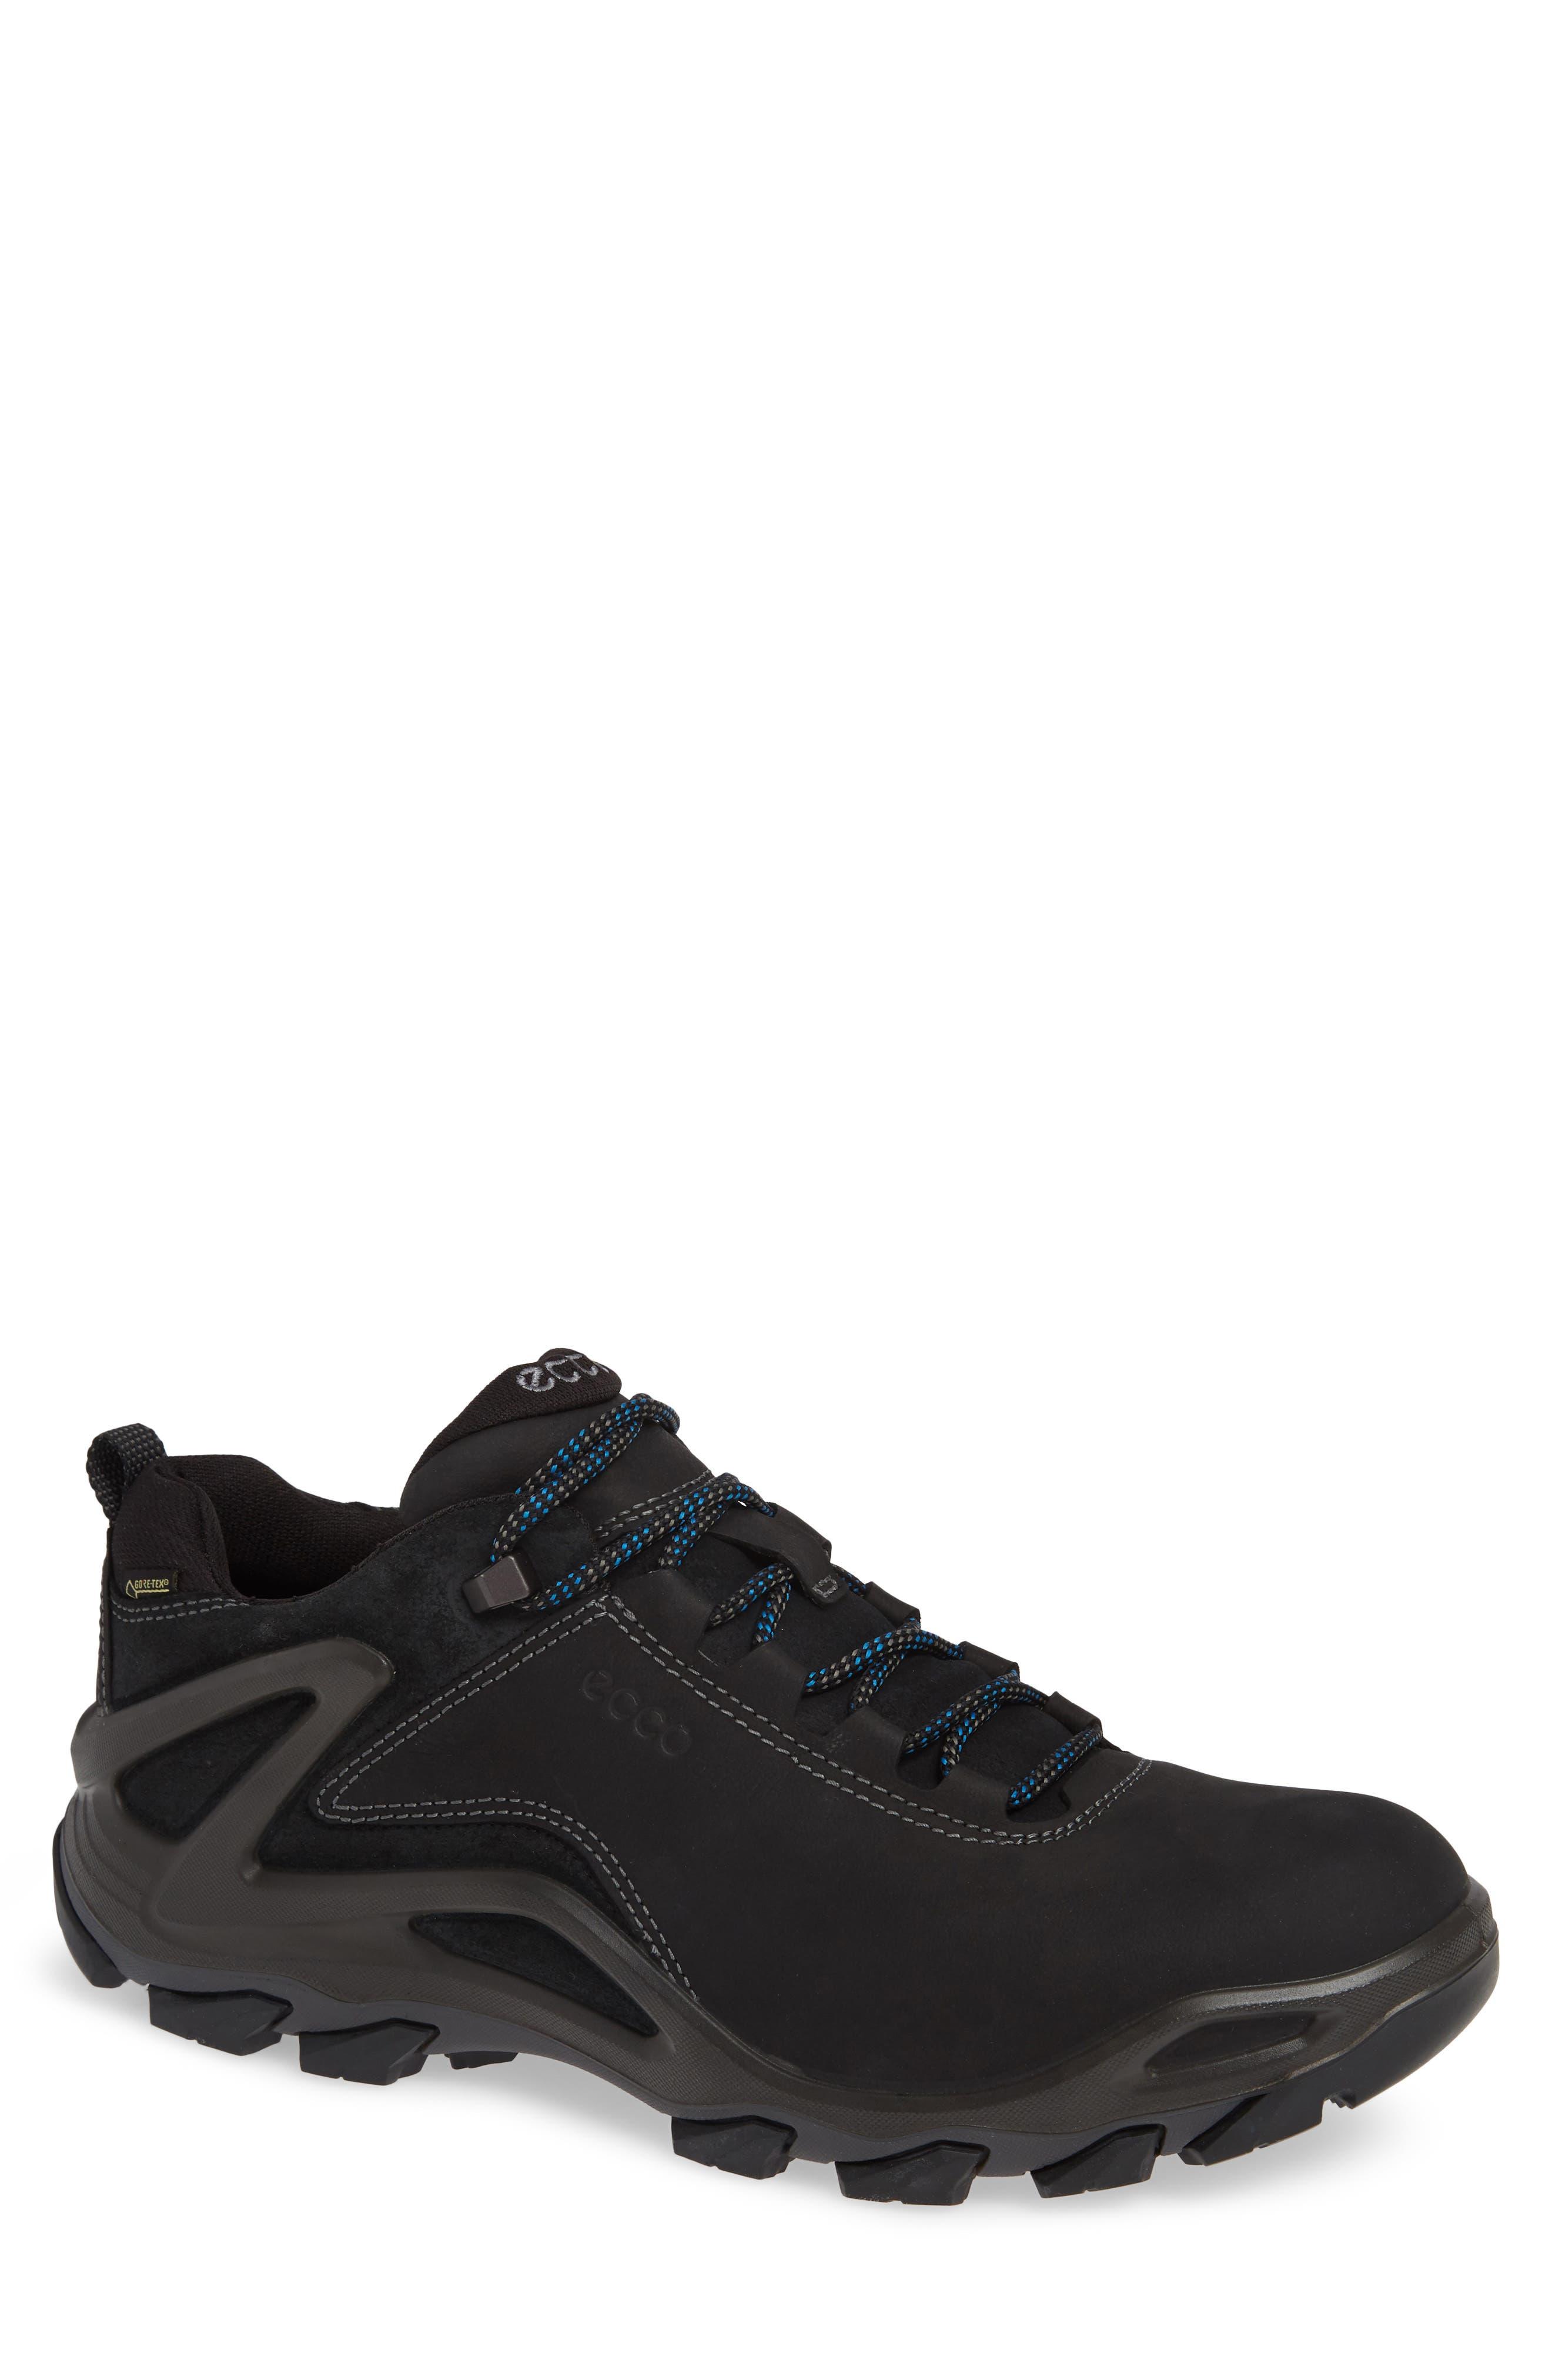 Terra Evo GTX Low Hiking Shoe,                             Main thumbnail 1, color,                             009